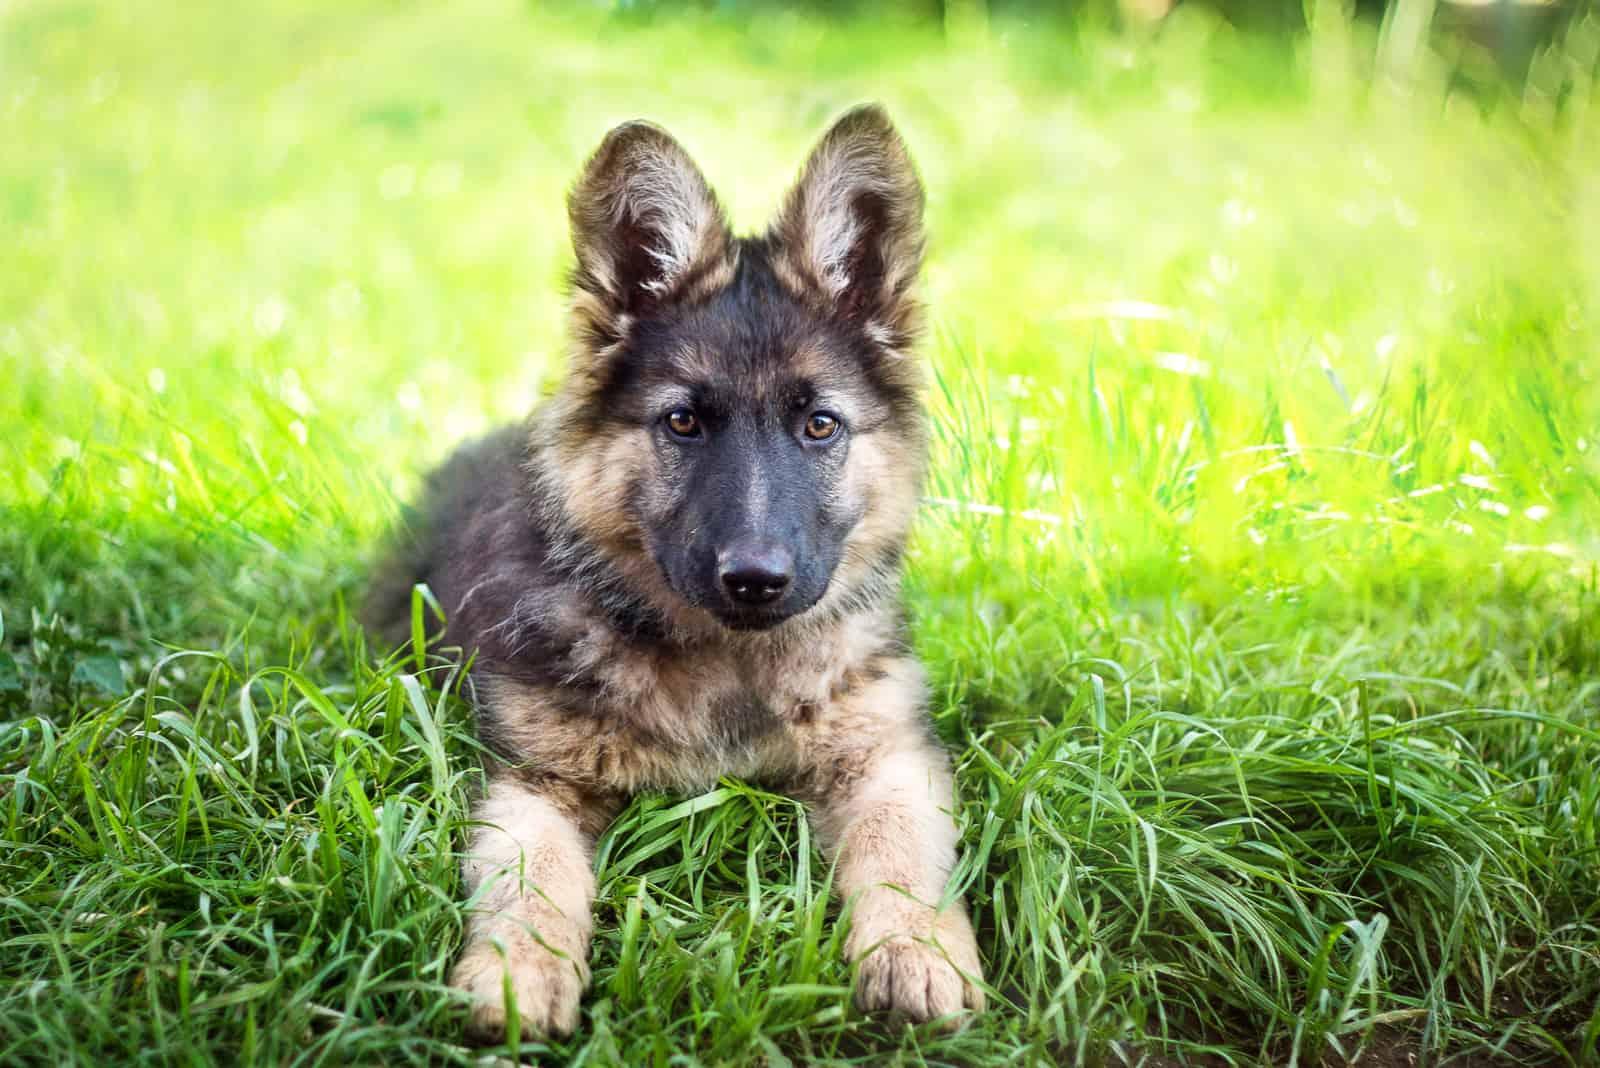 German Shepherd puppy on the grass